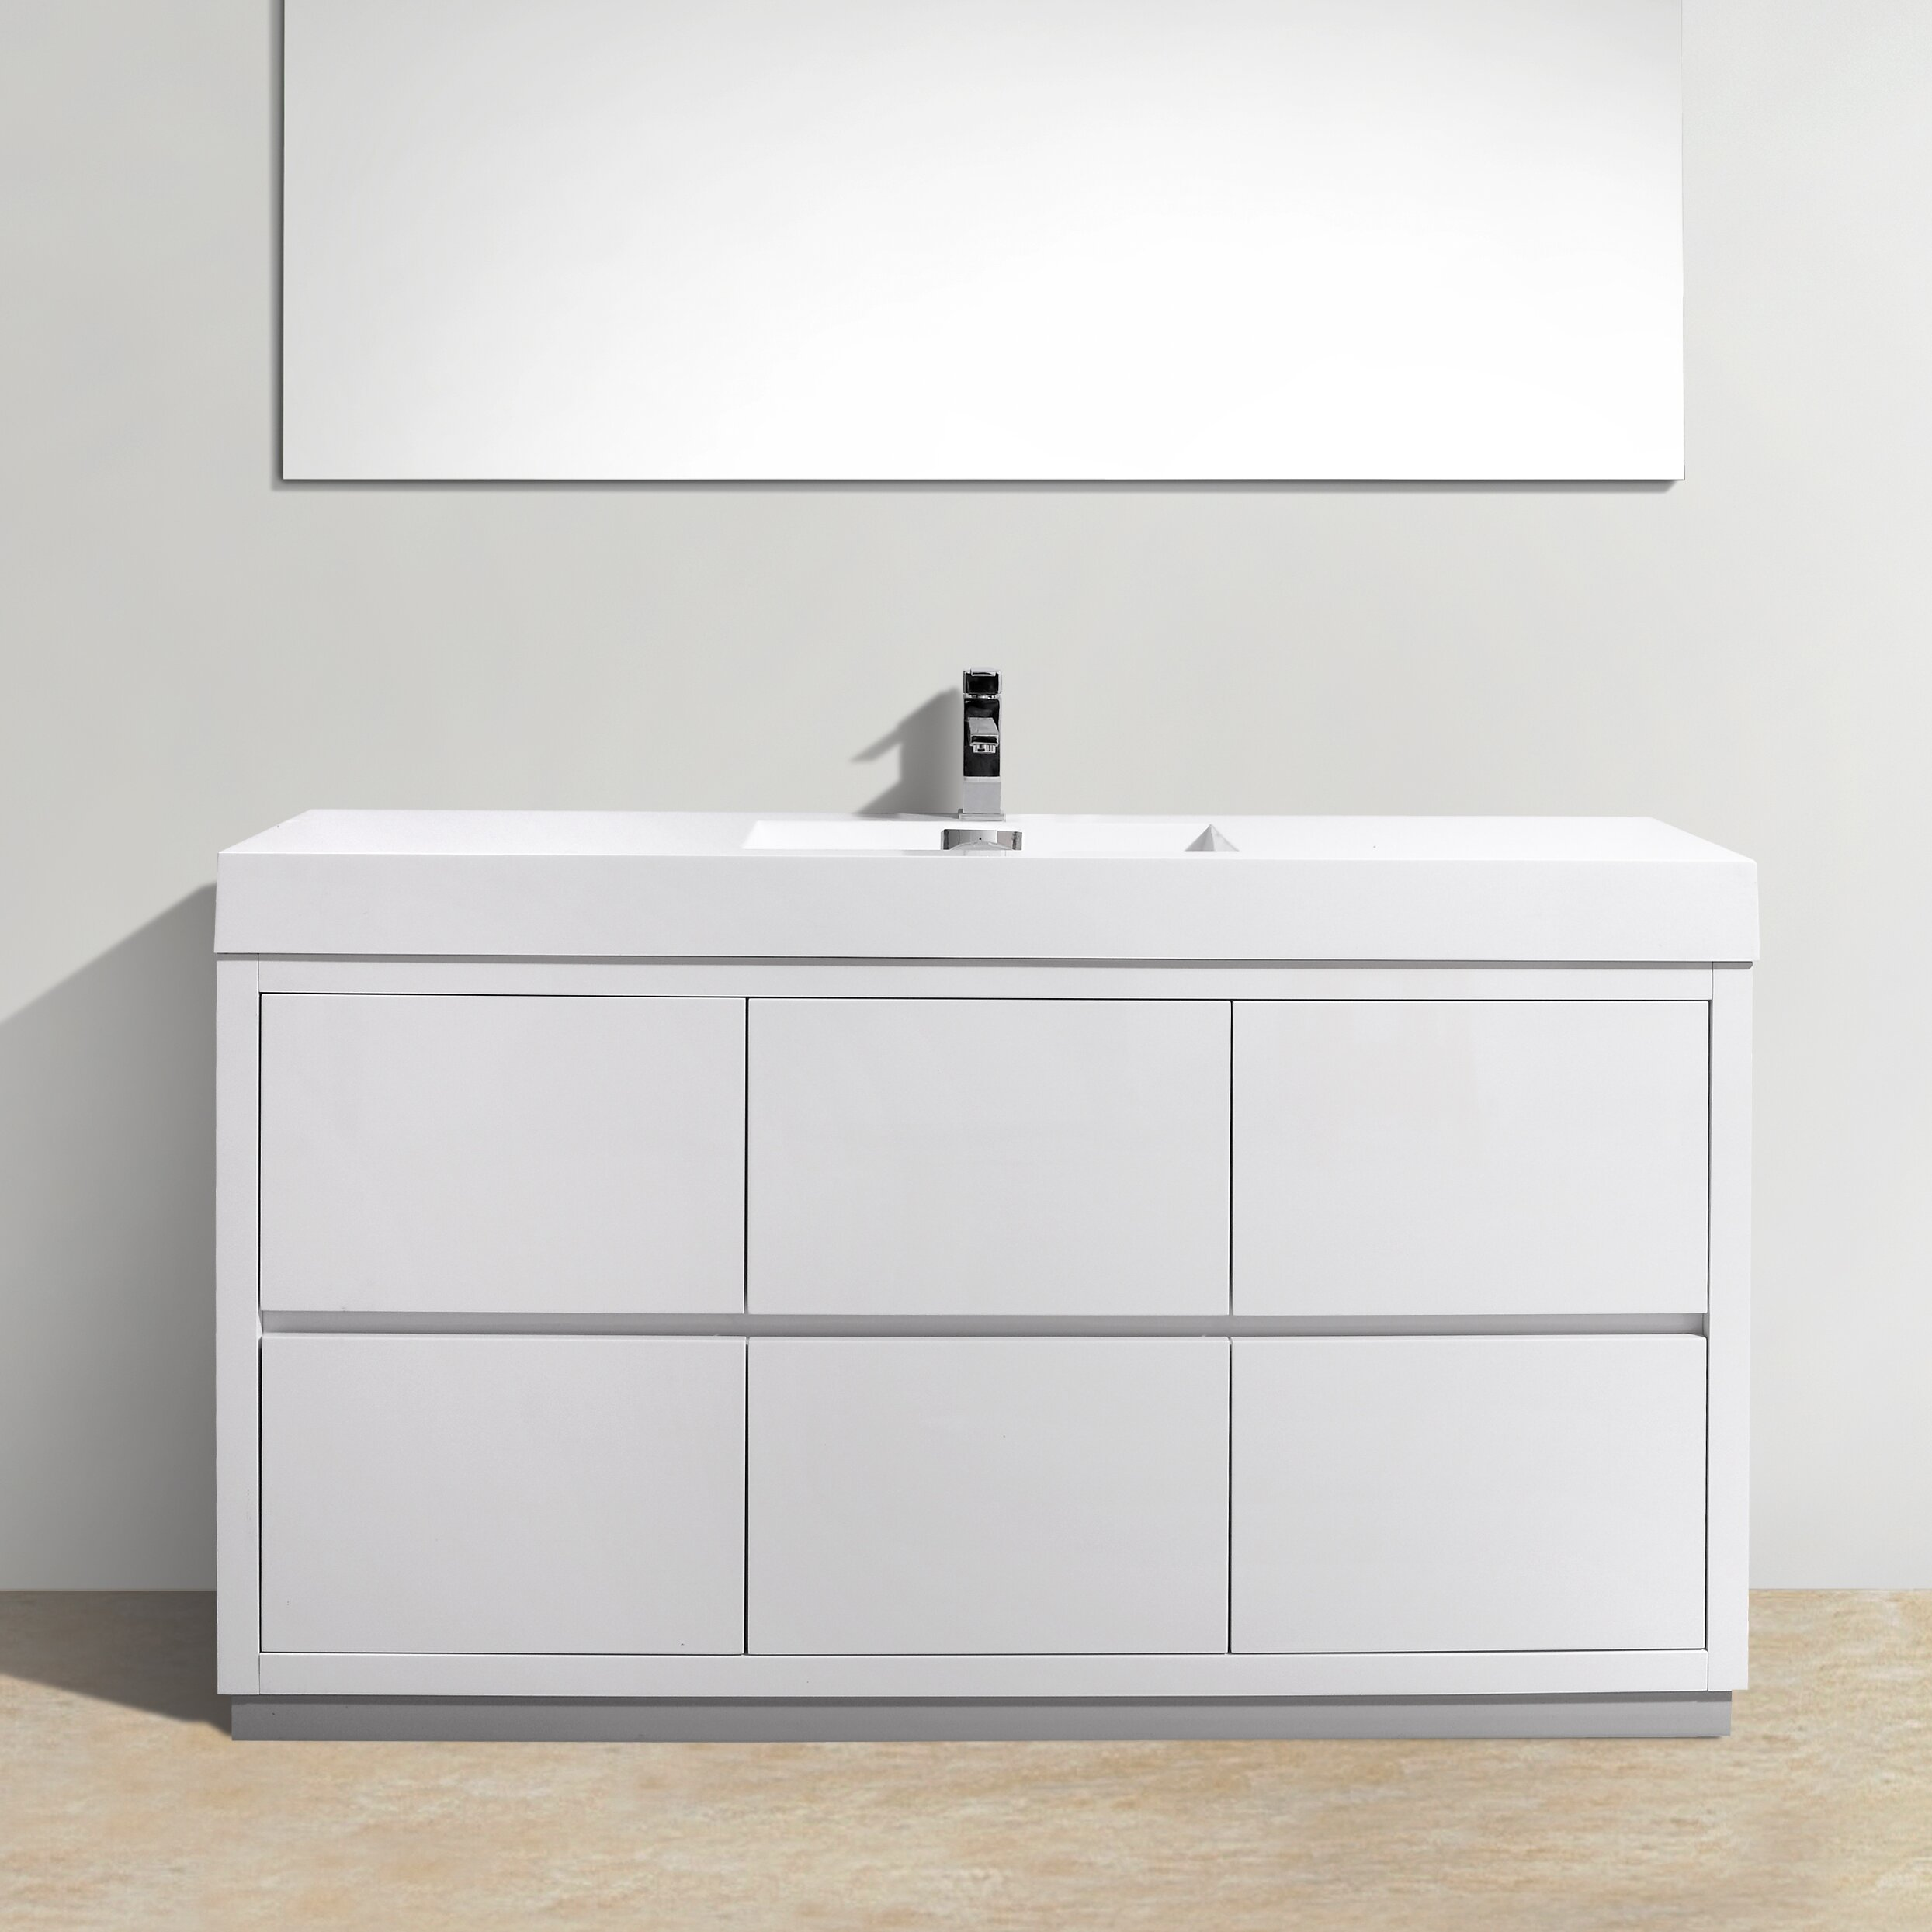 Kube Bath Bliss 60 amp quot  Single Free Standing Modern Bathroom Vanity Set. Bliss 60 quot  Single Free Standing Modern Bathroom Vanity Set